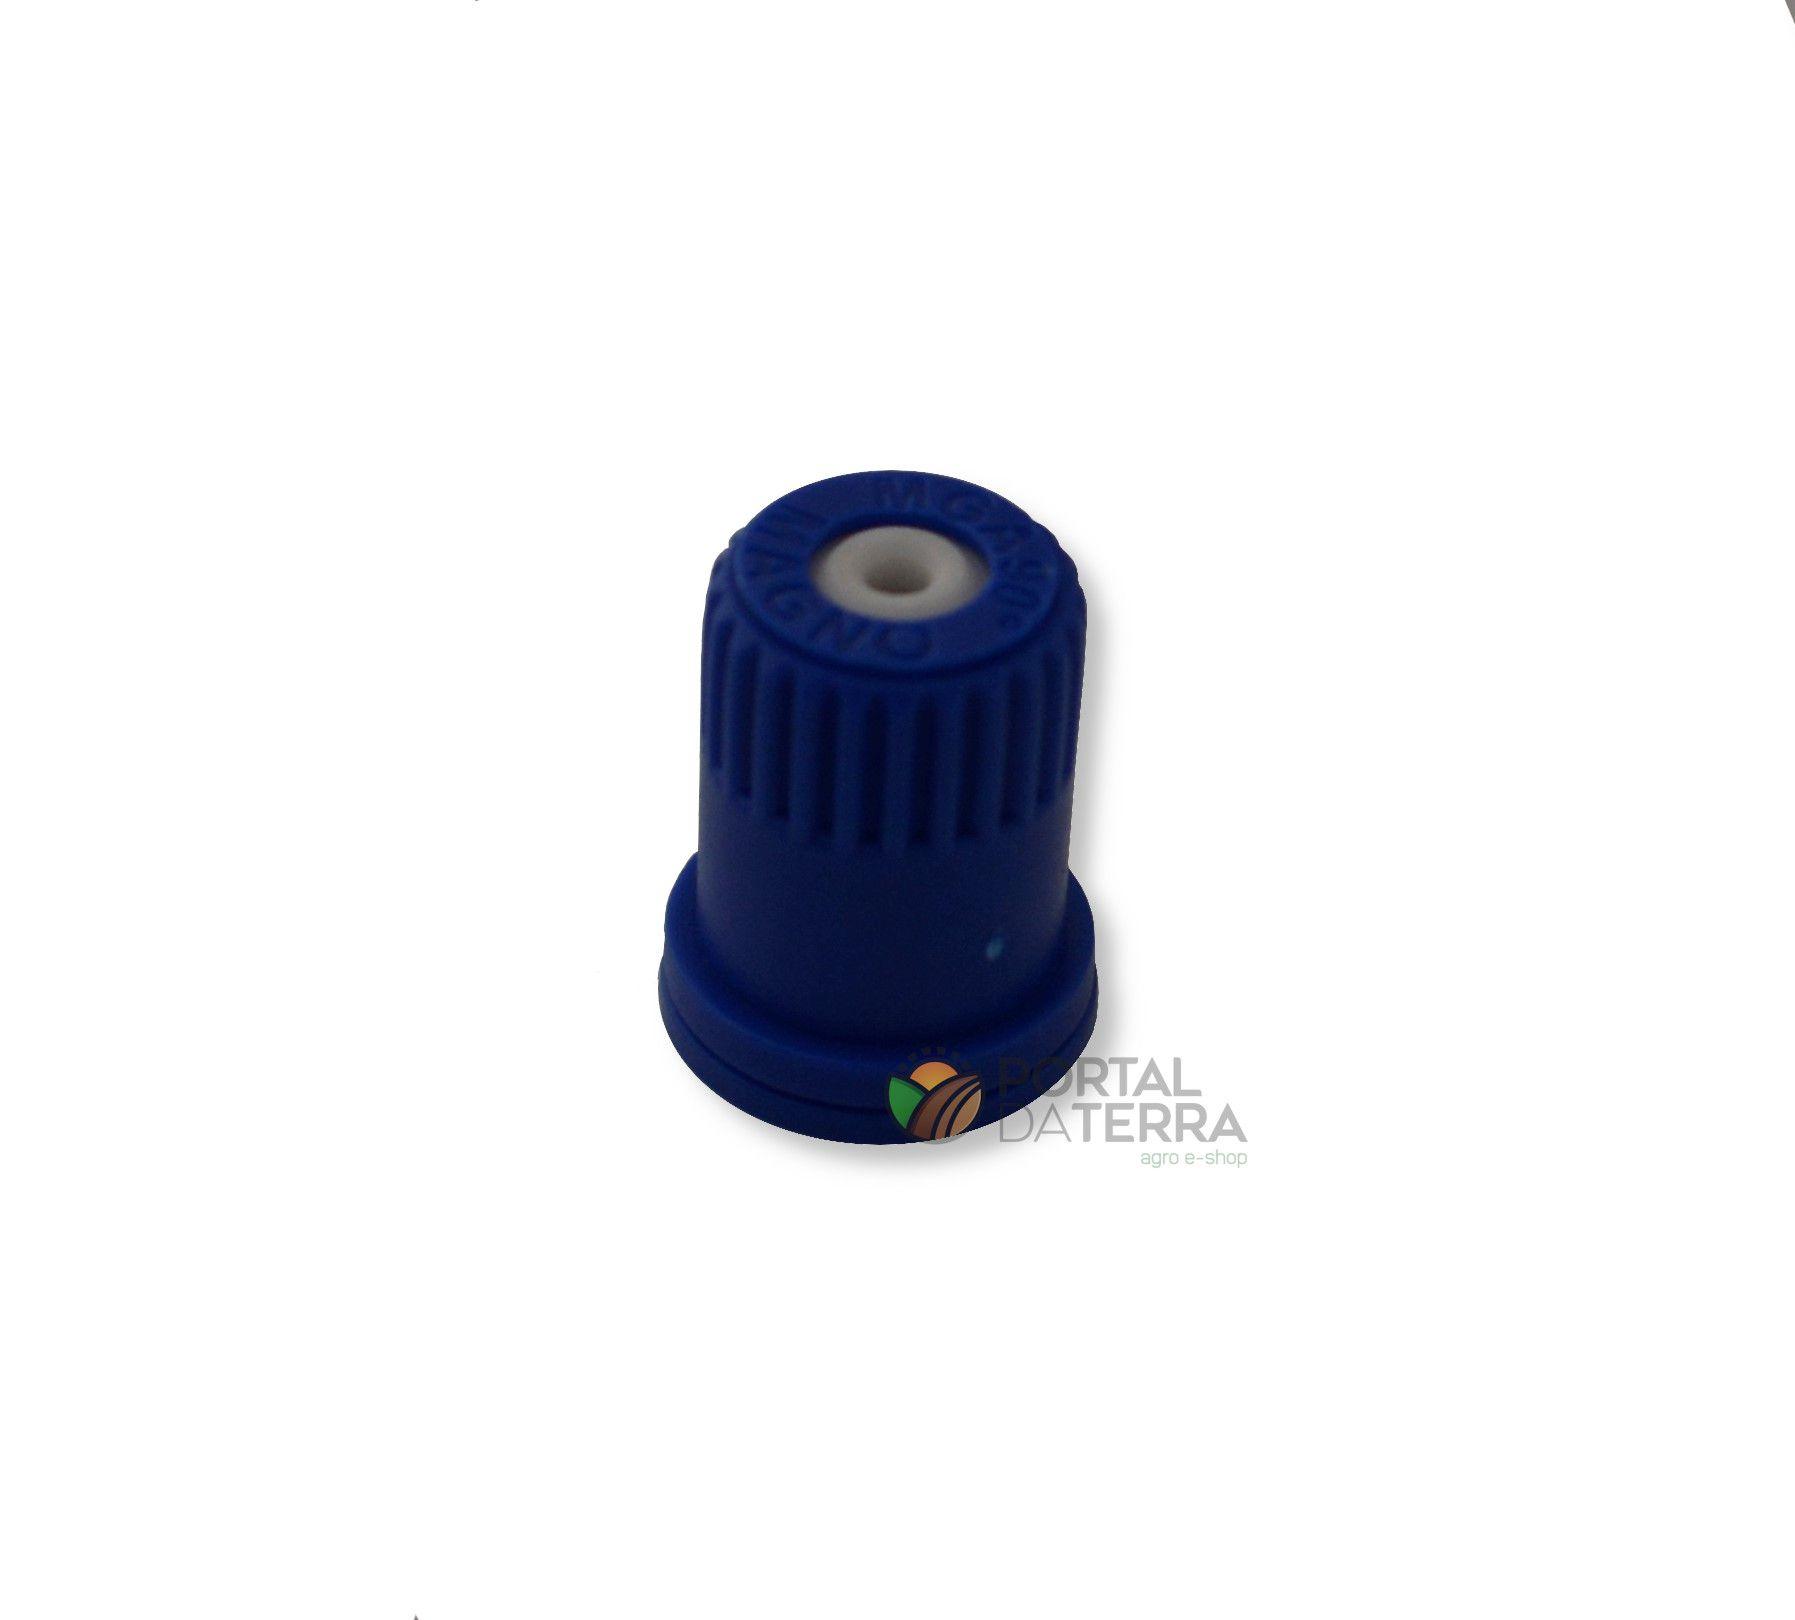 Bico Cone Gotas Atomizadas MGA 9003- Azul